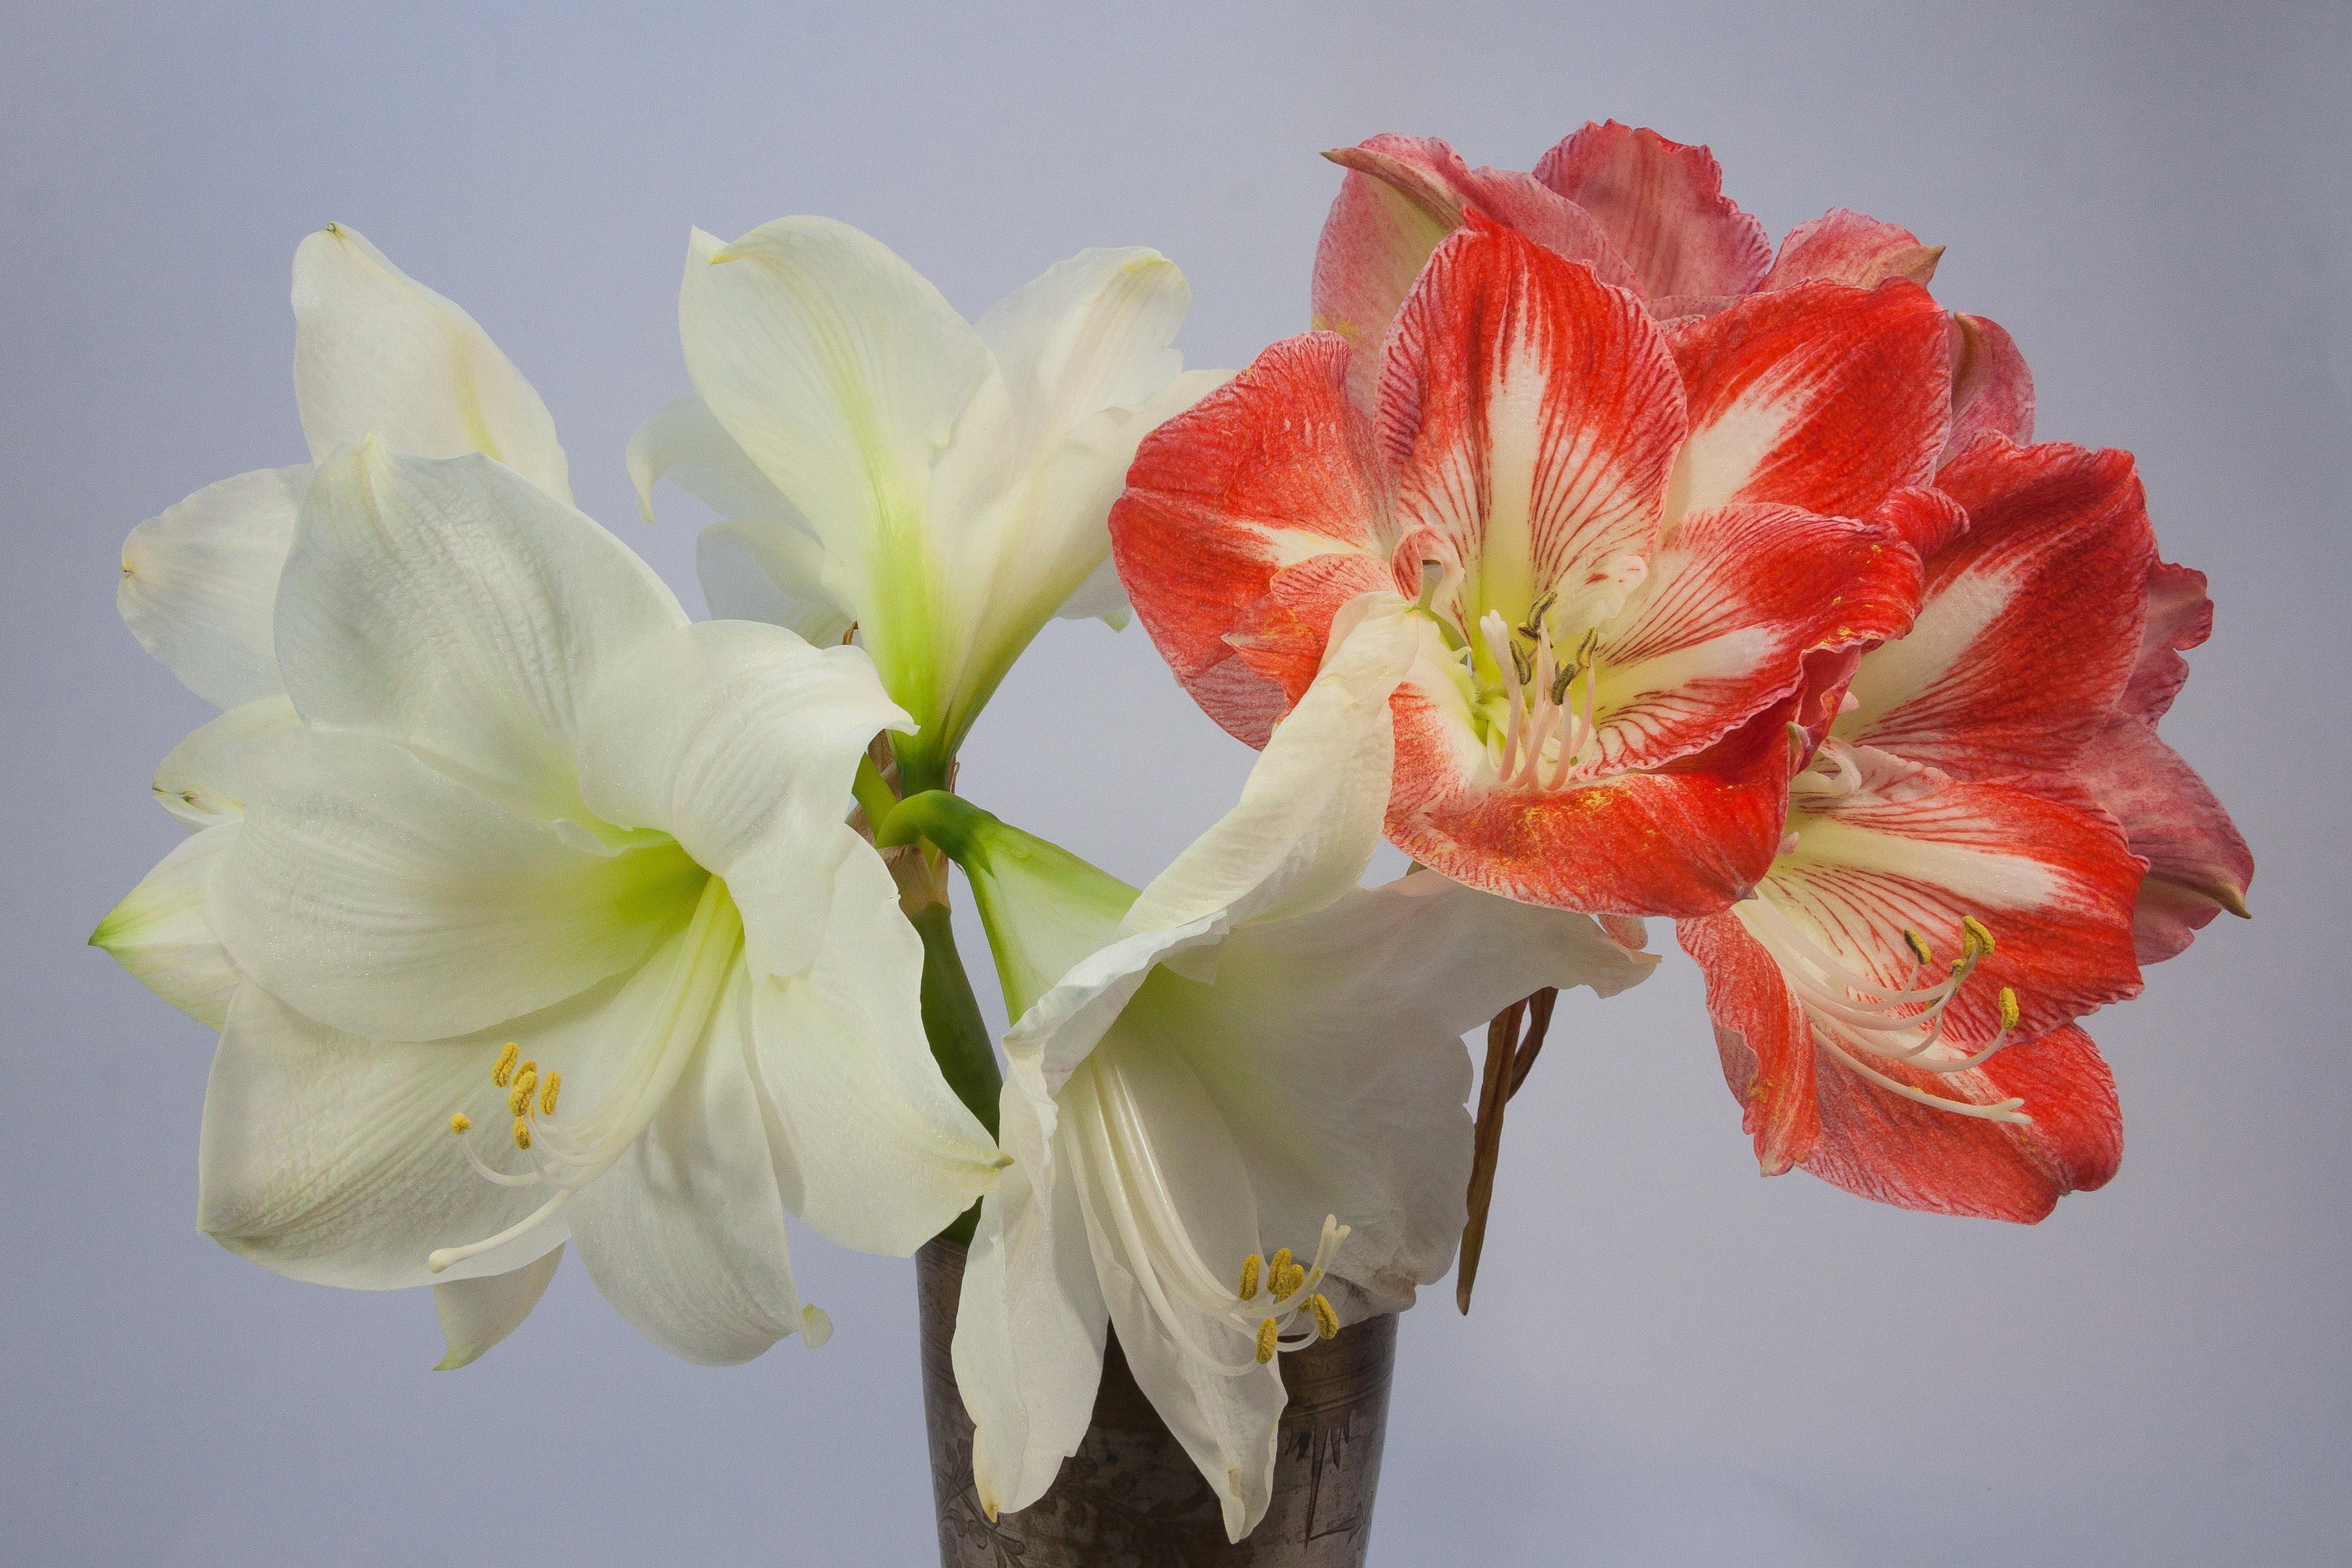 Free images blossom white flower petal bloom for Amaryllis en bouquet